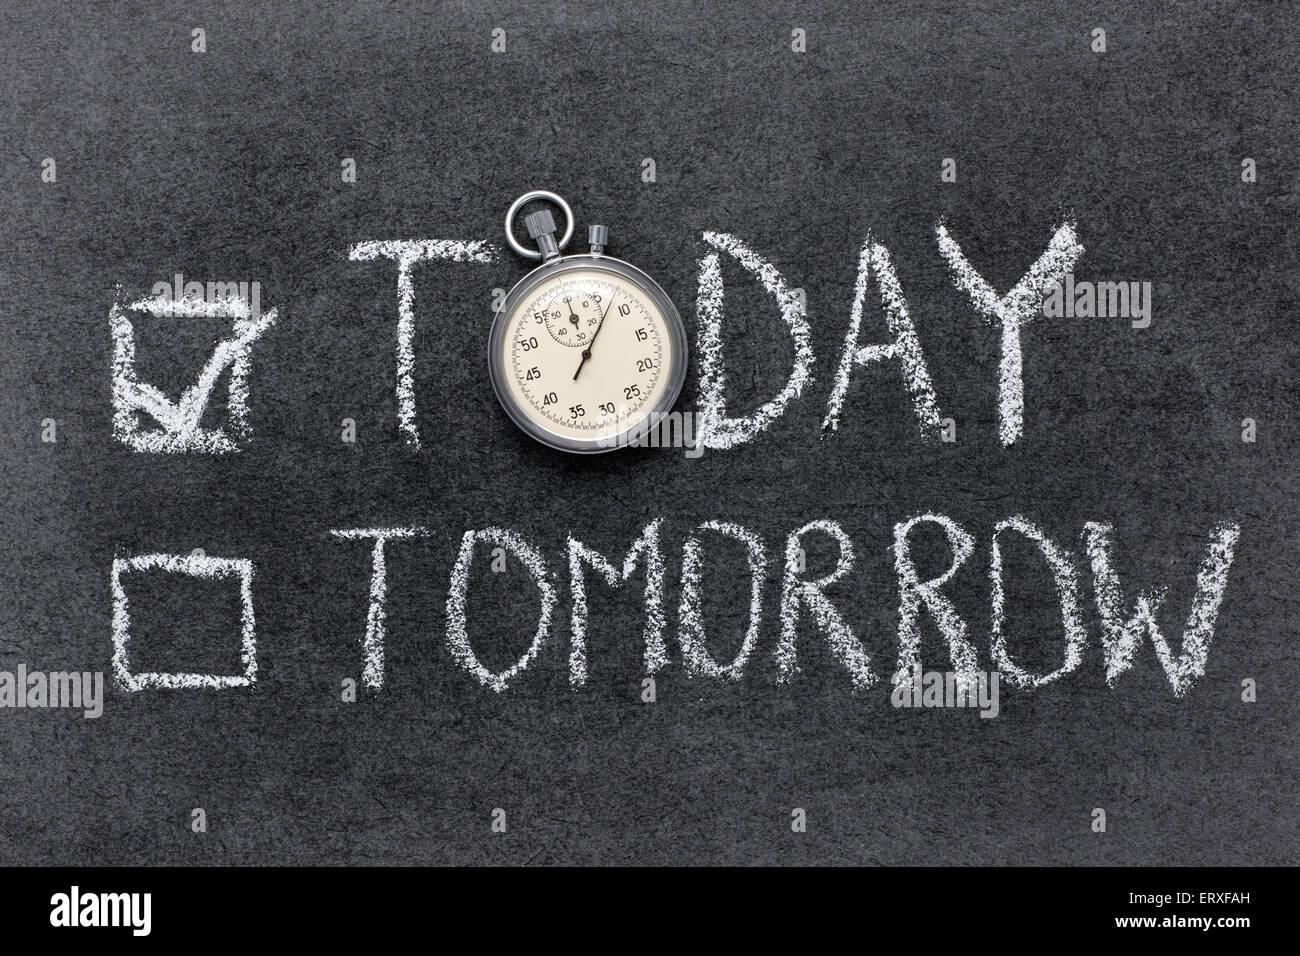 Hoy o mañana el concepto manuscrito en pizarra con vintage cronómetro exacto utilizado en lugar de O Imagen De Stock